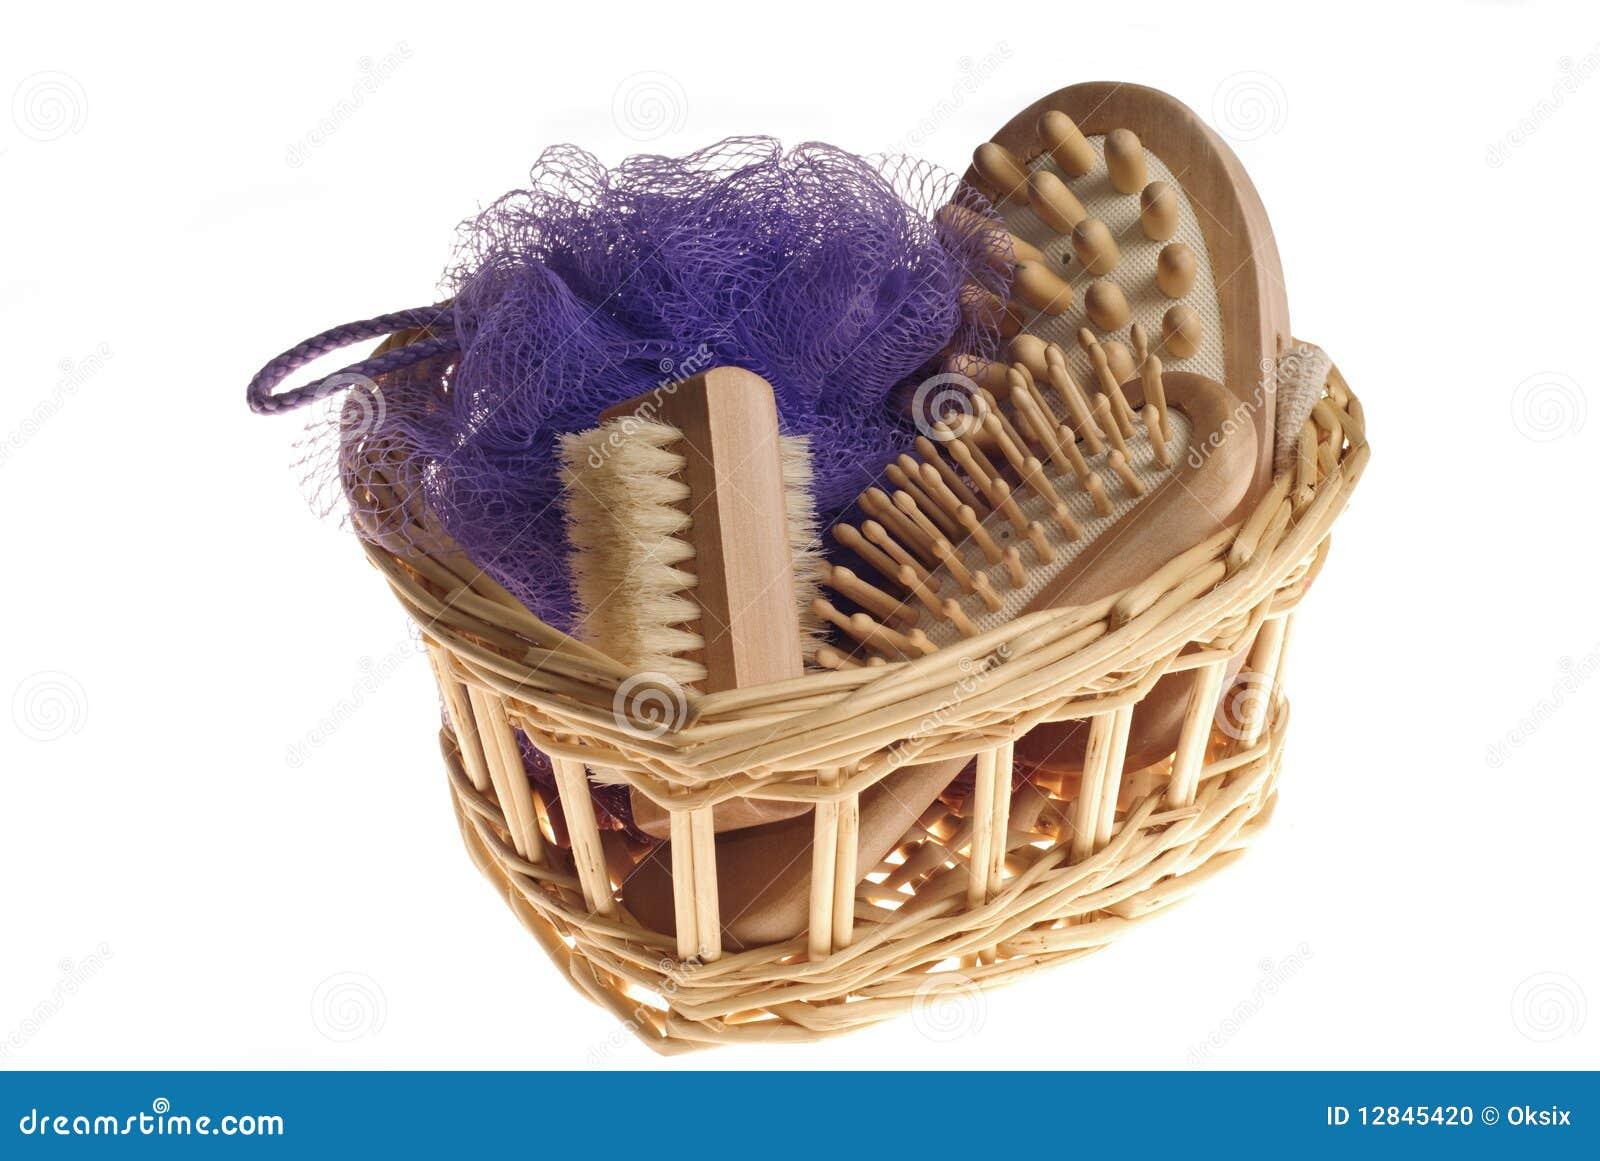 bath spa kit stock photo image 12845420